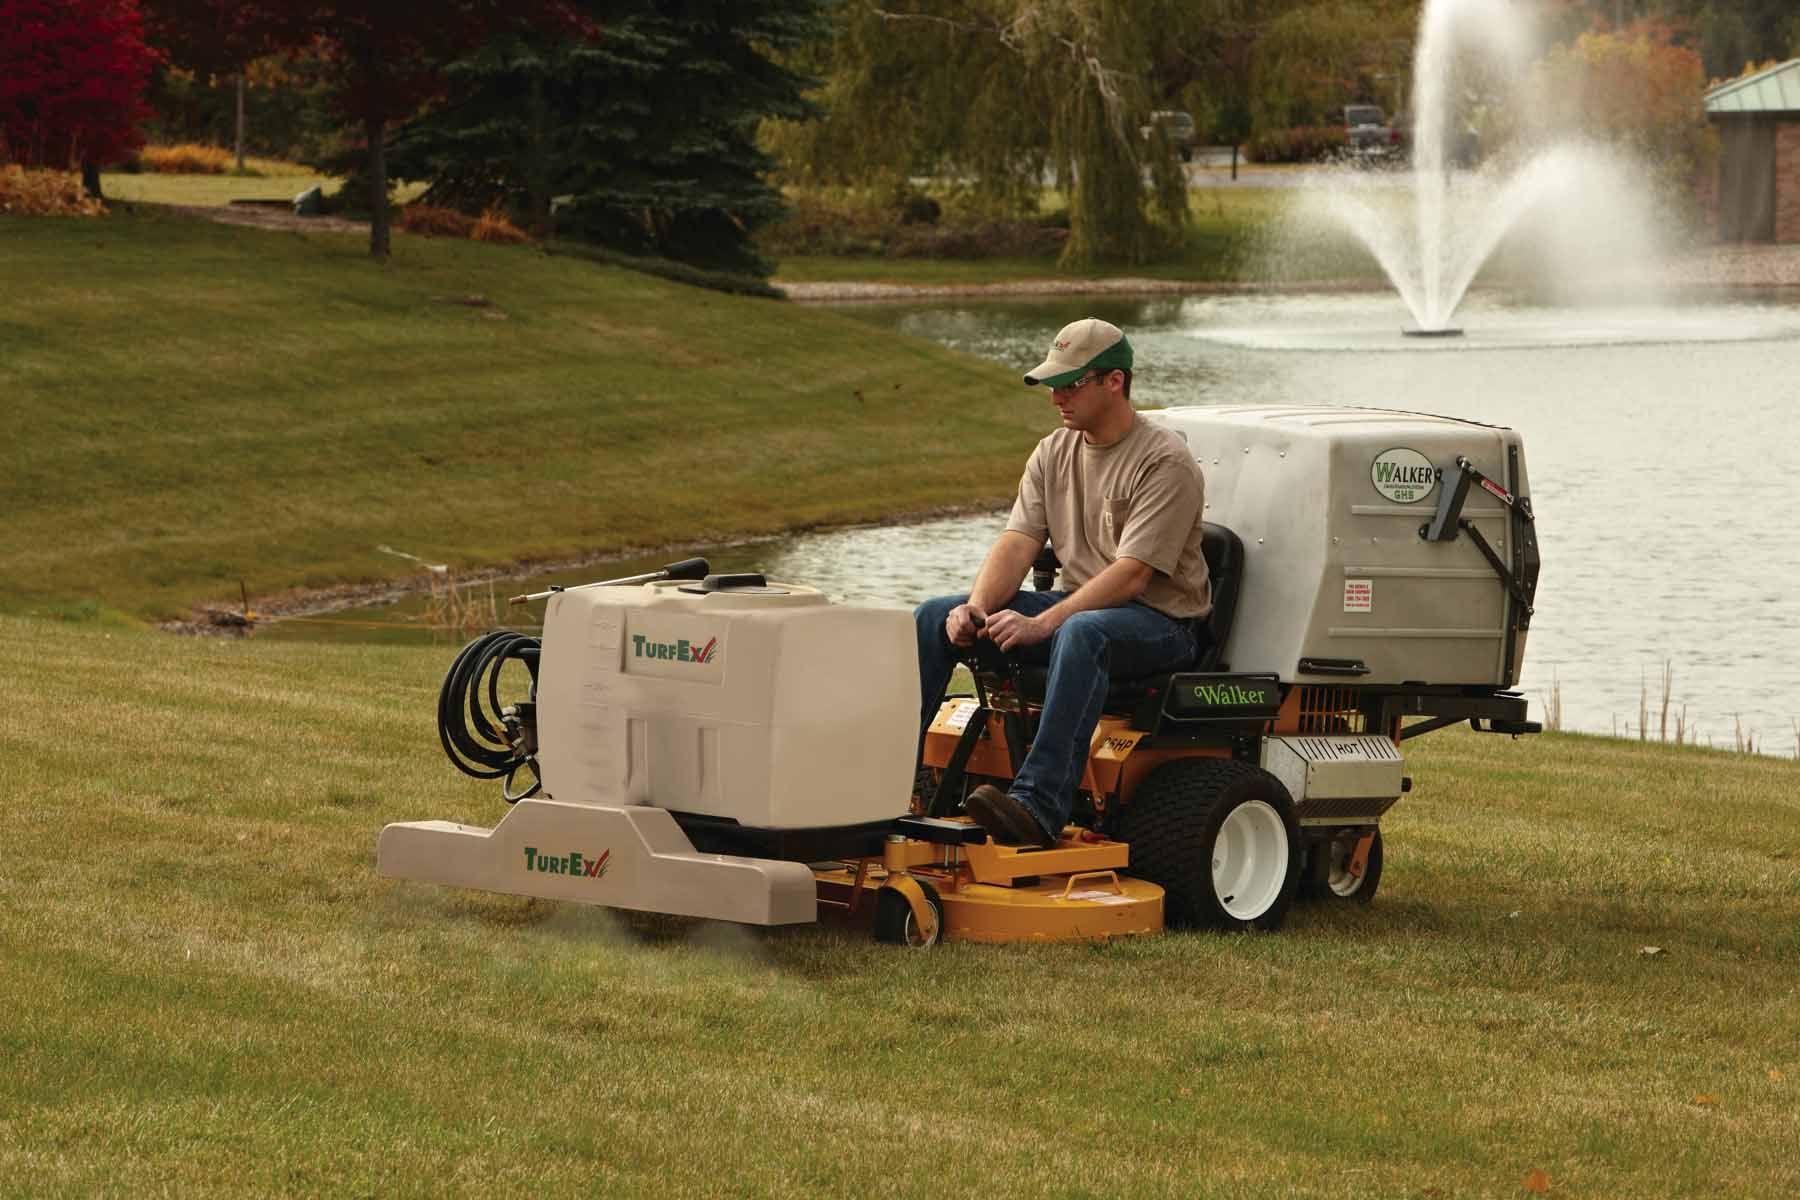 TurfEx US250 Zero Turn Mower Sprayer Attachment